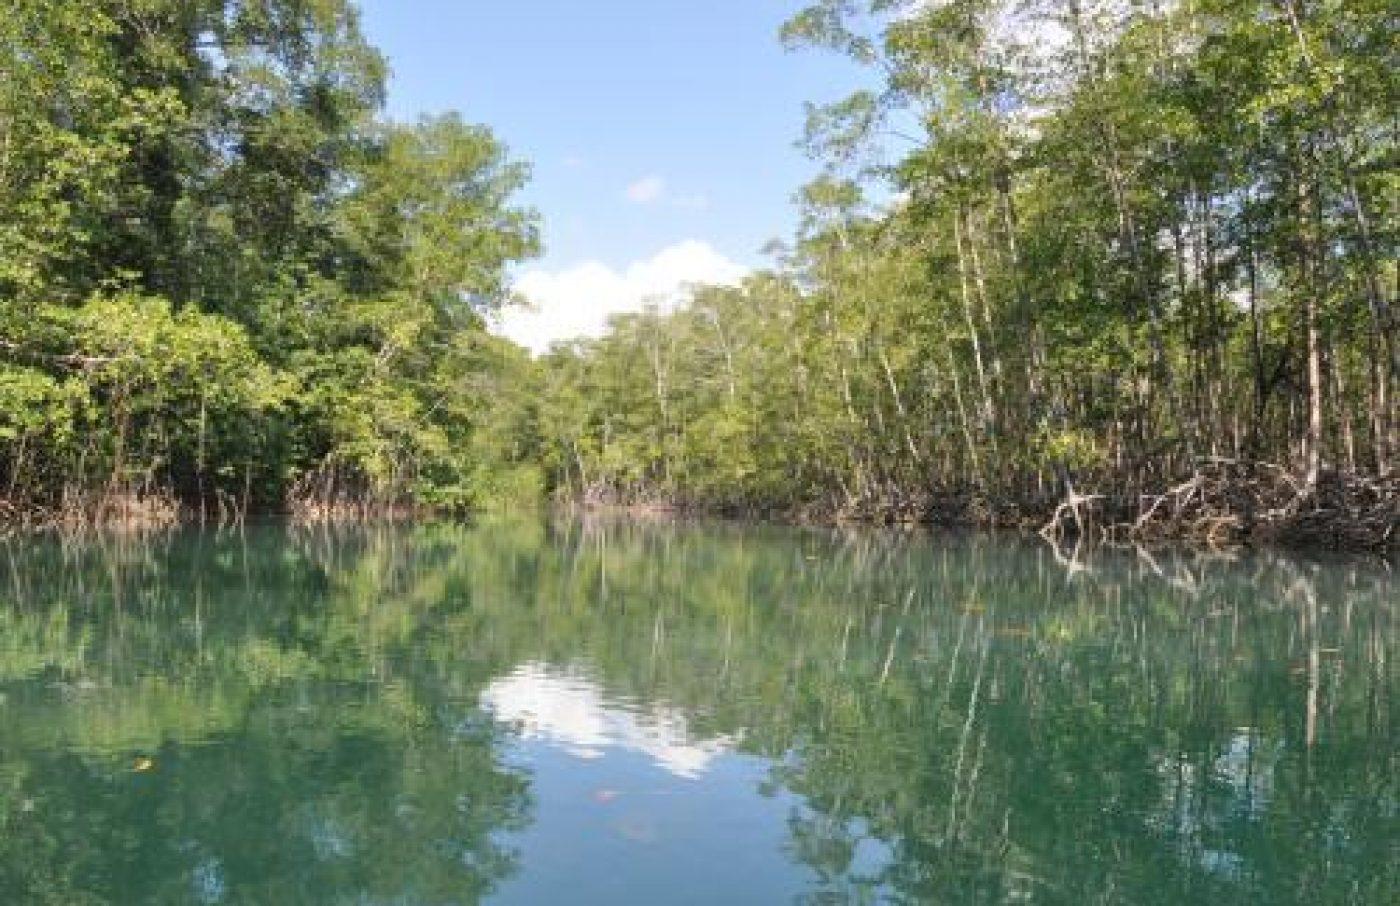 Island Mangrove and Monkey Tour